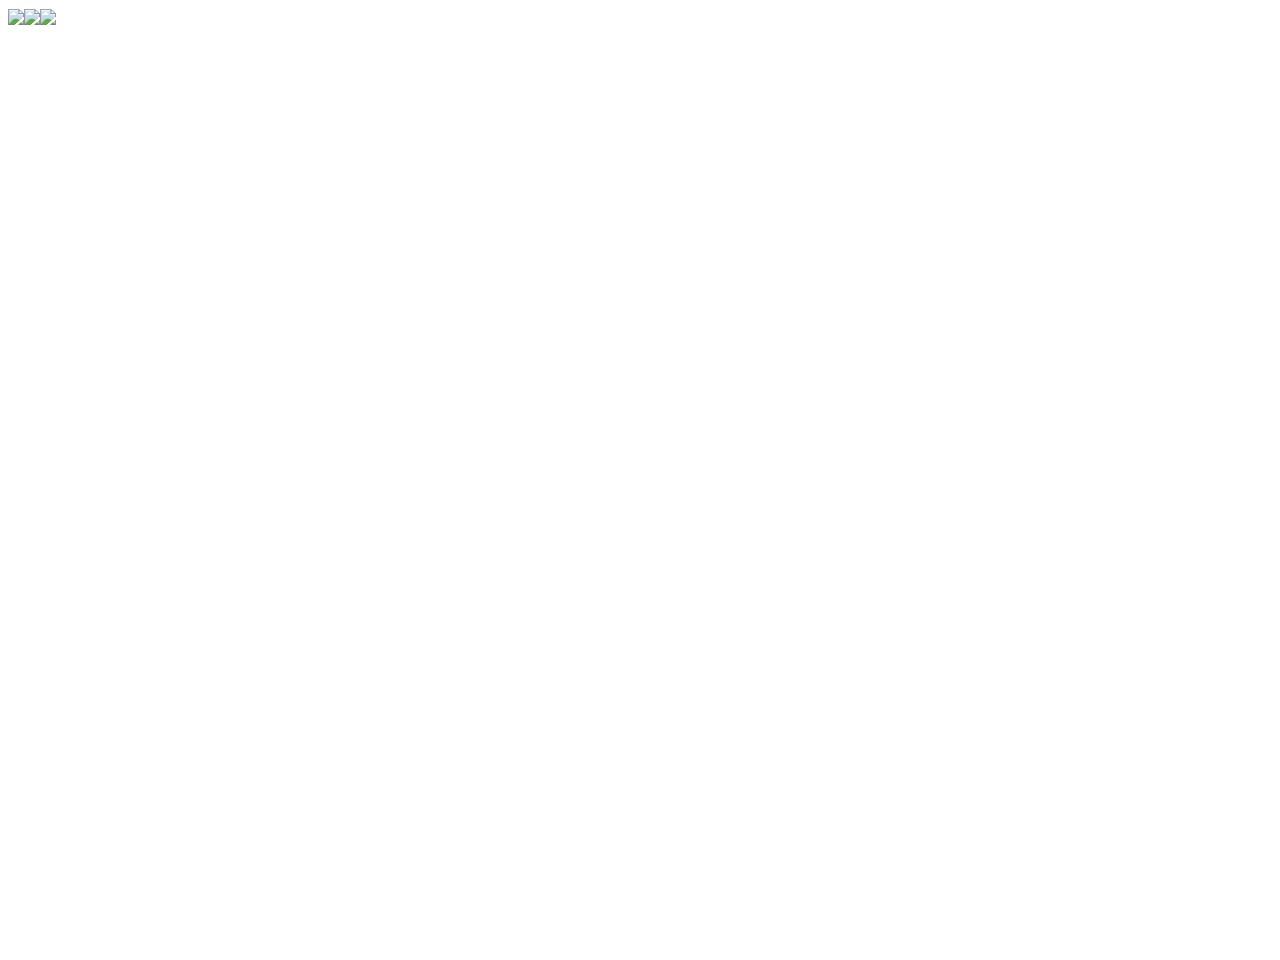 B12电影网_全网电影资源大全_最新免费无广告在线观看